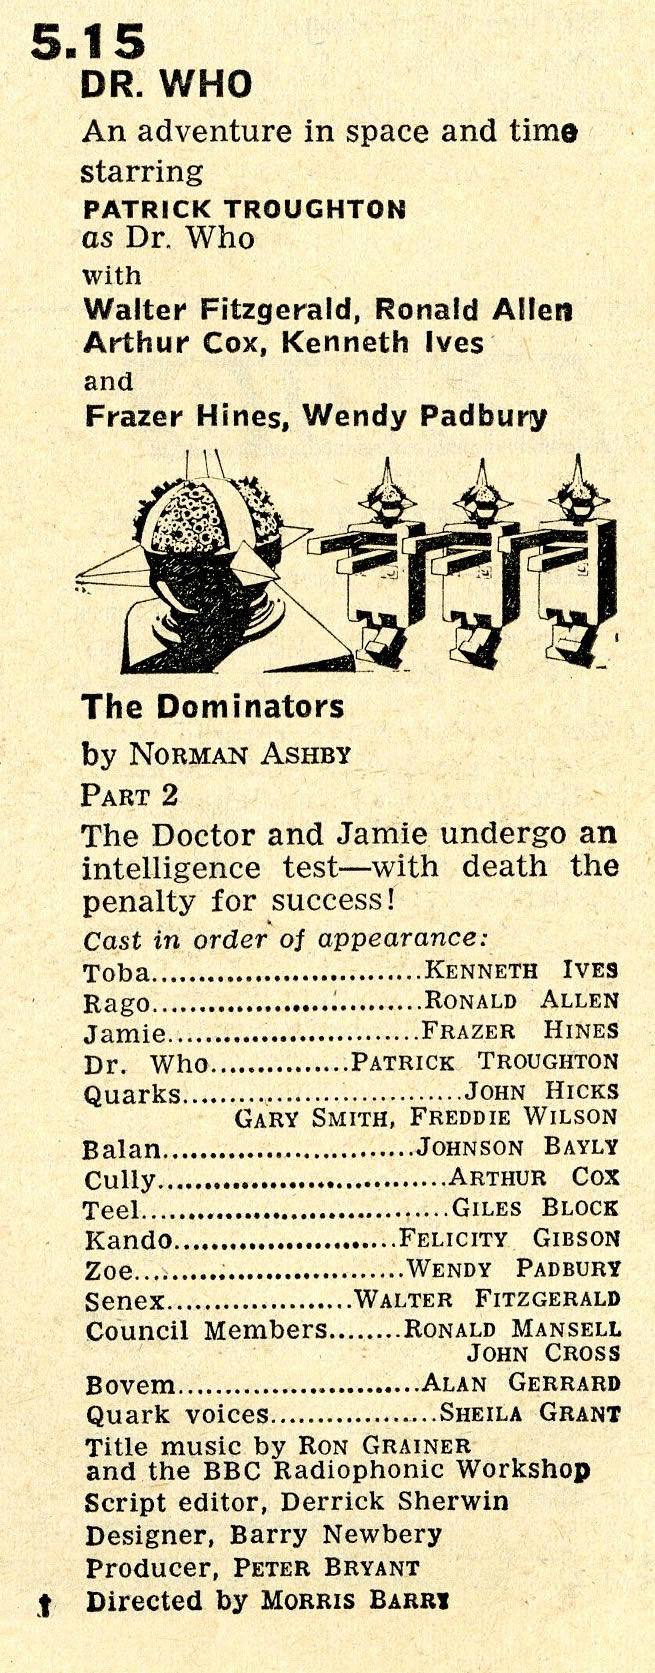 Radio Times, 17-23 August 1968